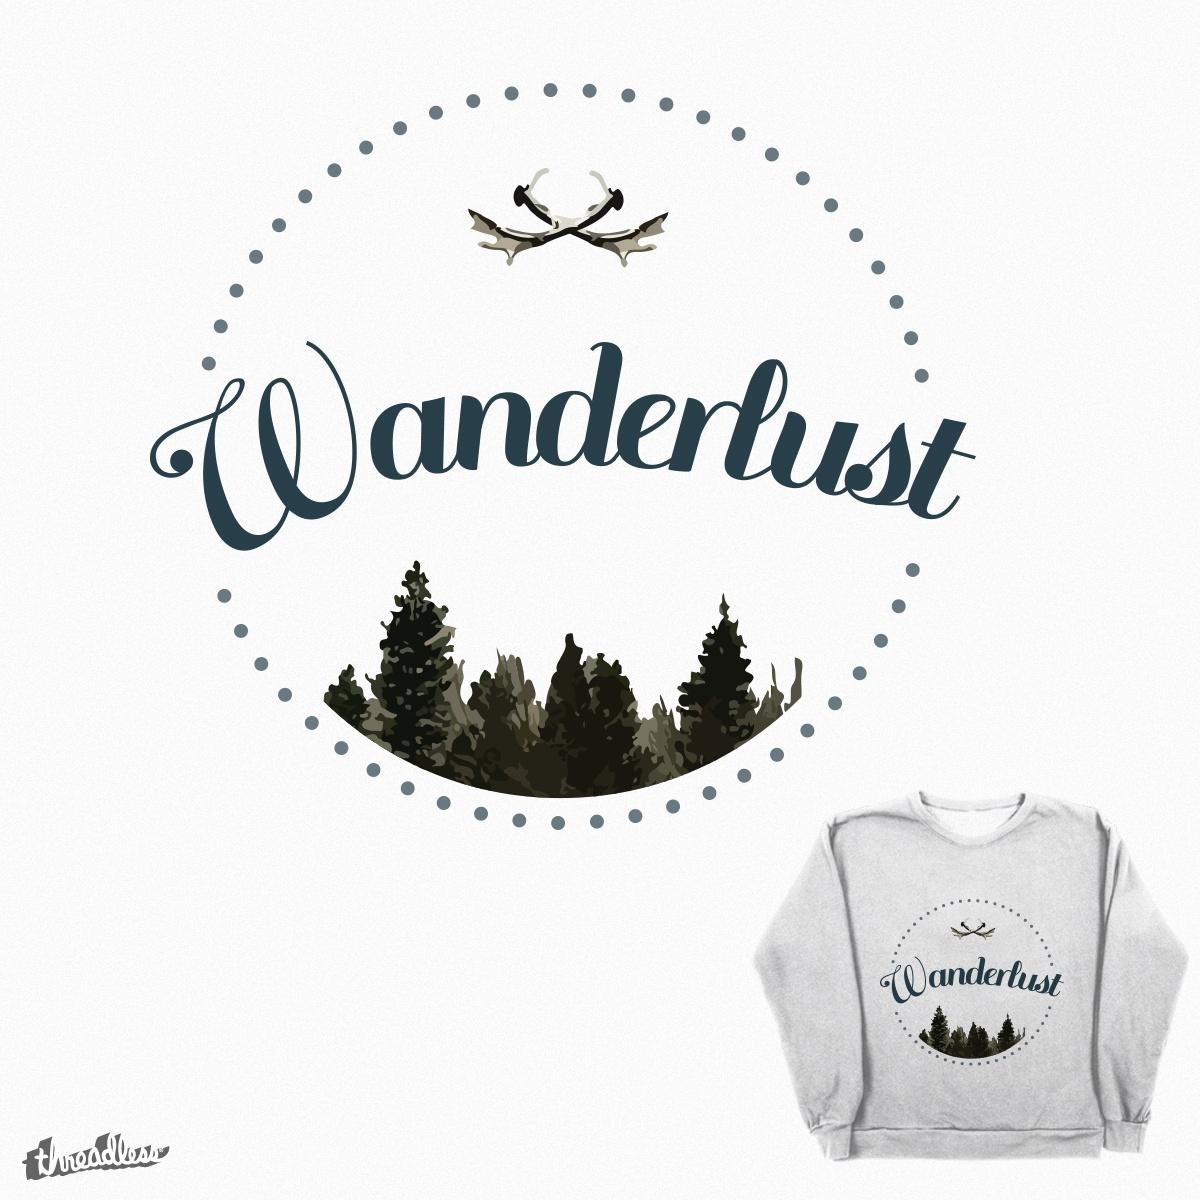 Wanderlust by JessicaSCastillo on Threadless